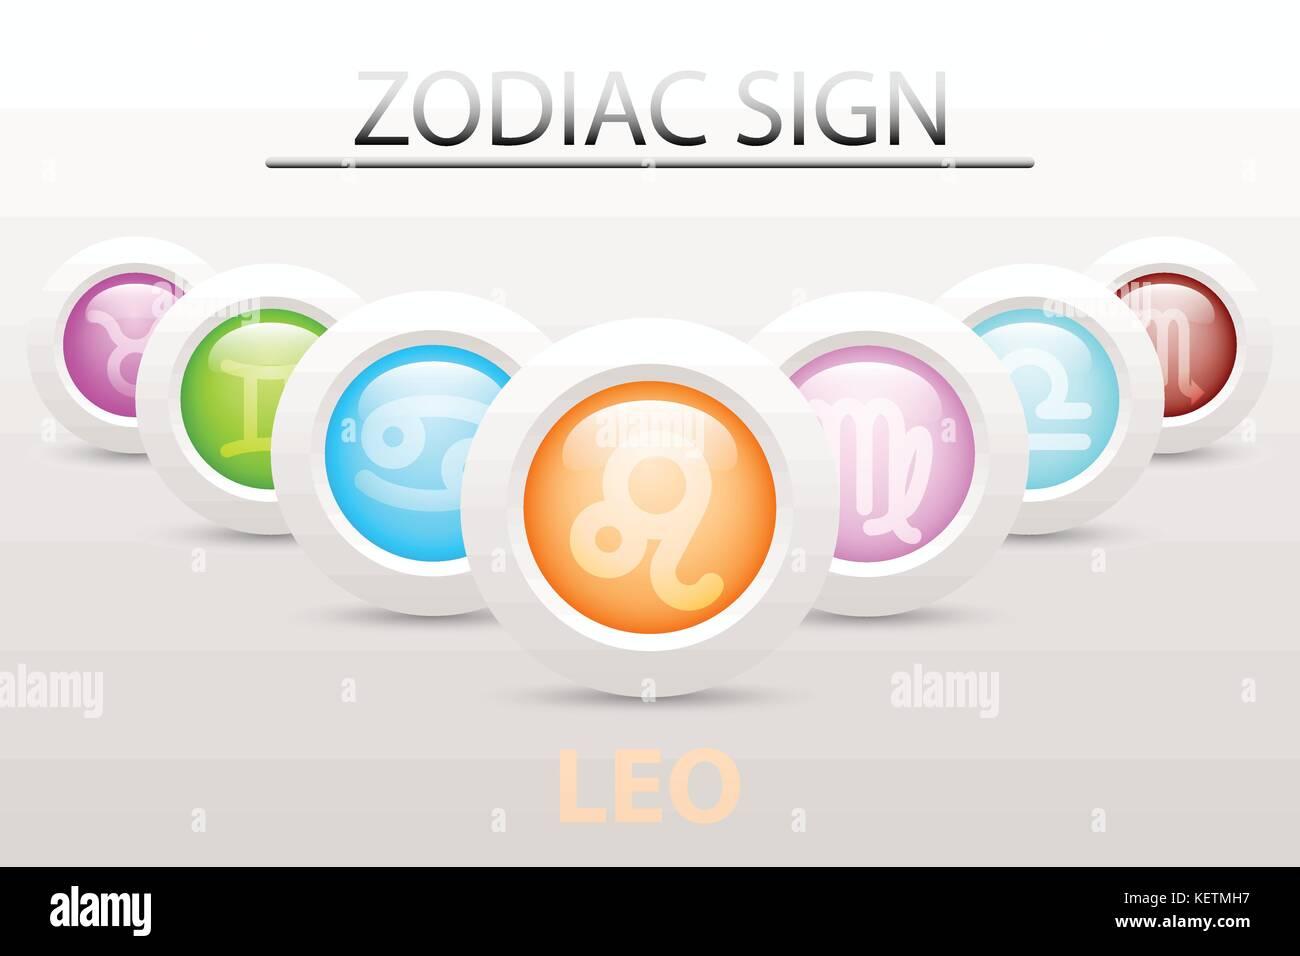 Libra Symbol Zodiac Sign Illustration Stock Photos Libra Symbol